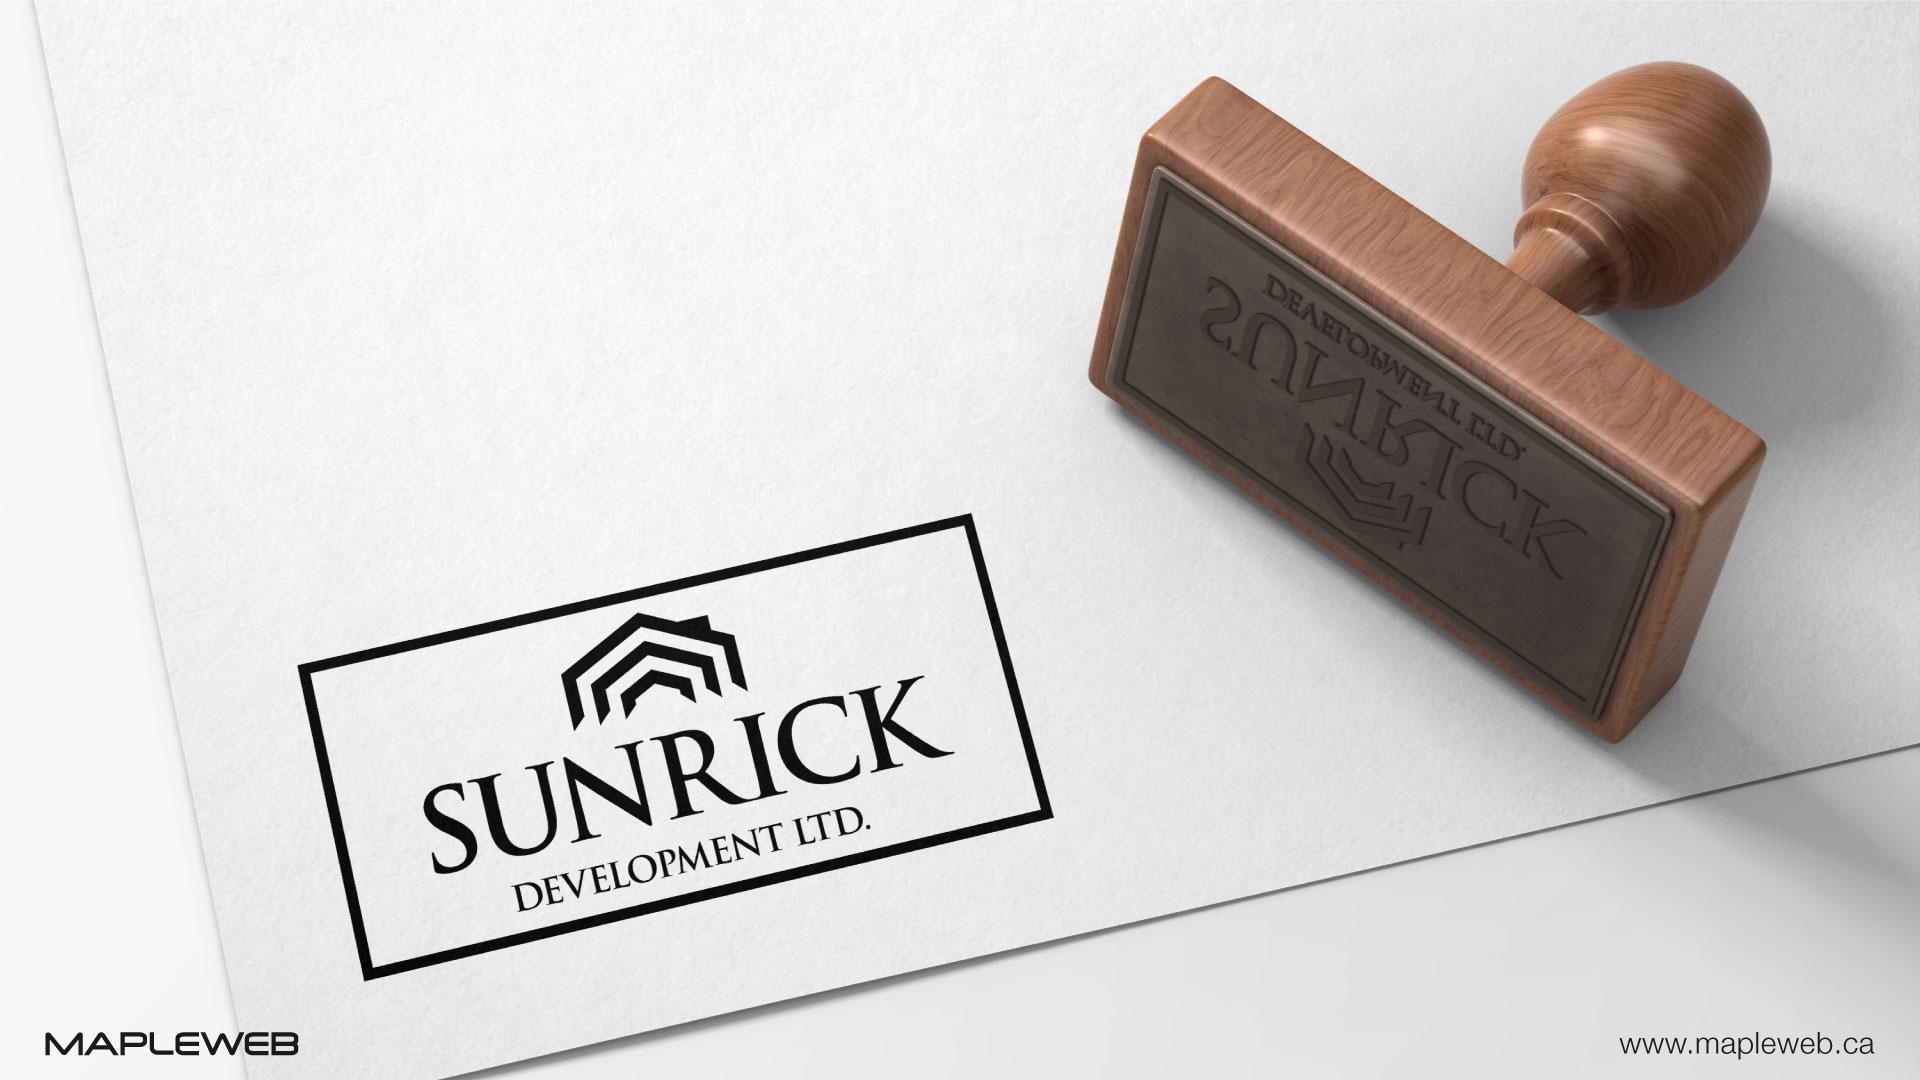 sunrick-development-ltd-brand-logo-design-by-mapleweb-vancouver-canada-stamp-mock